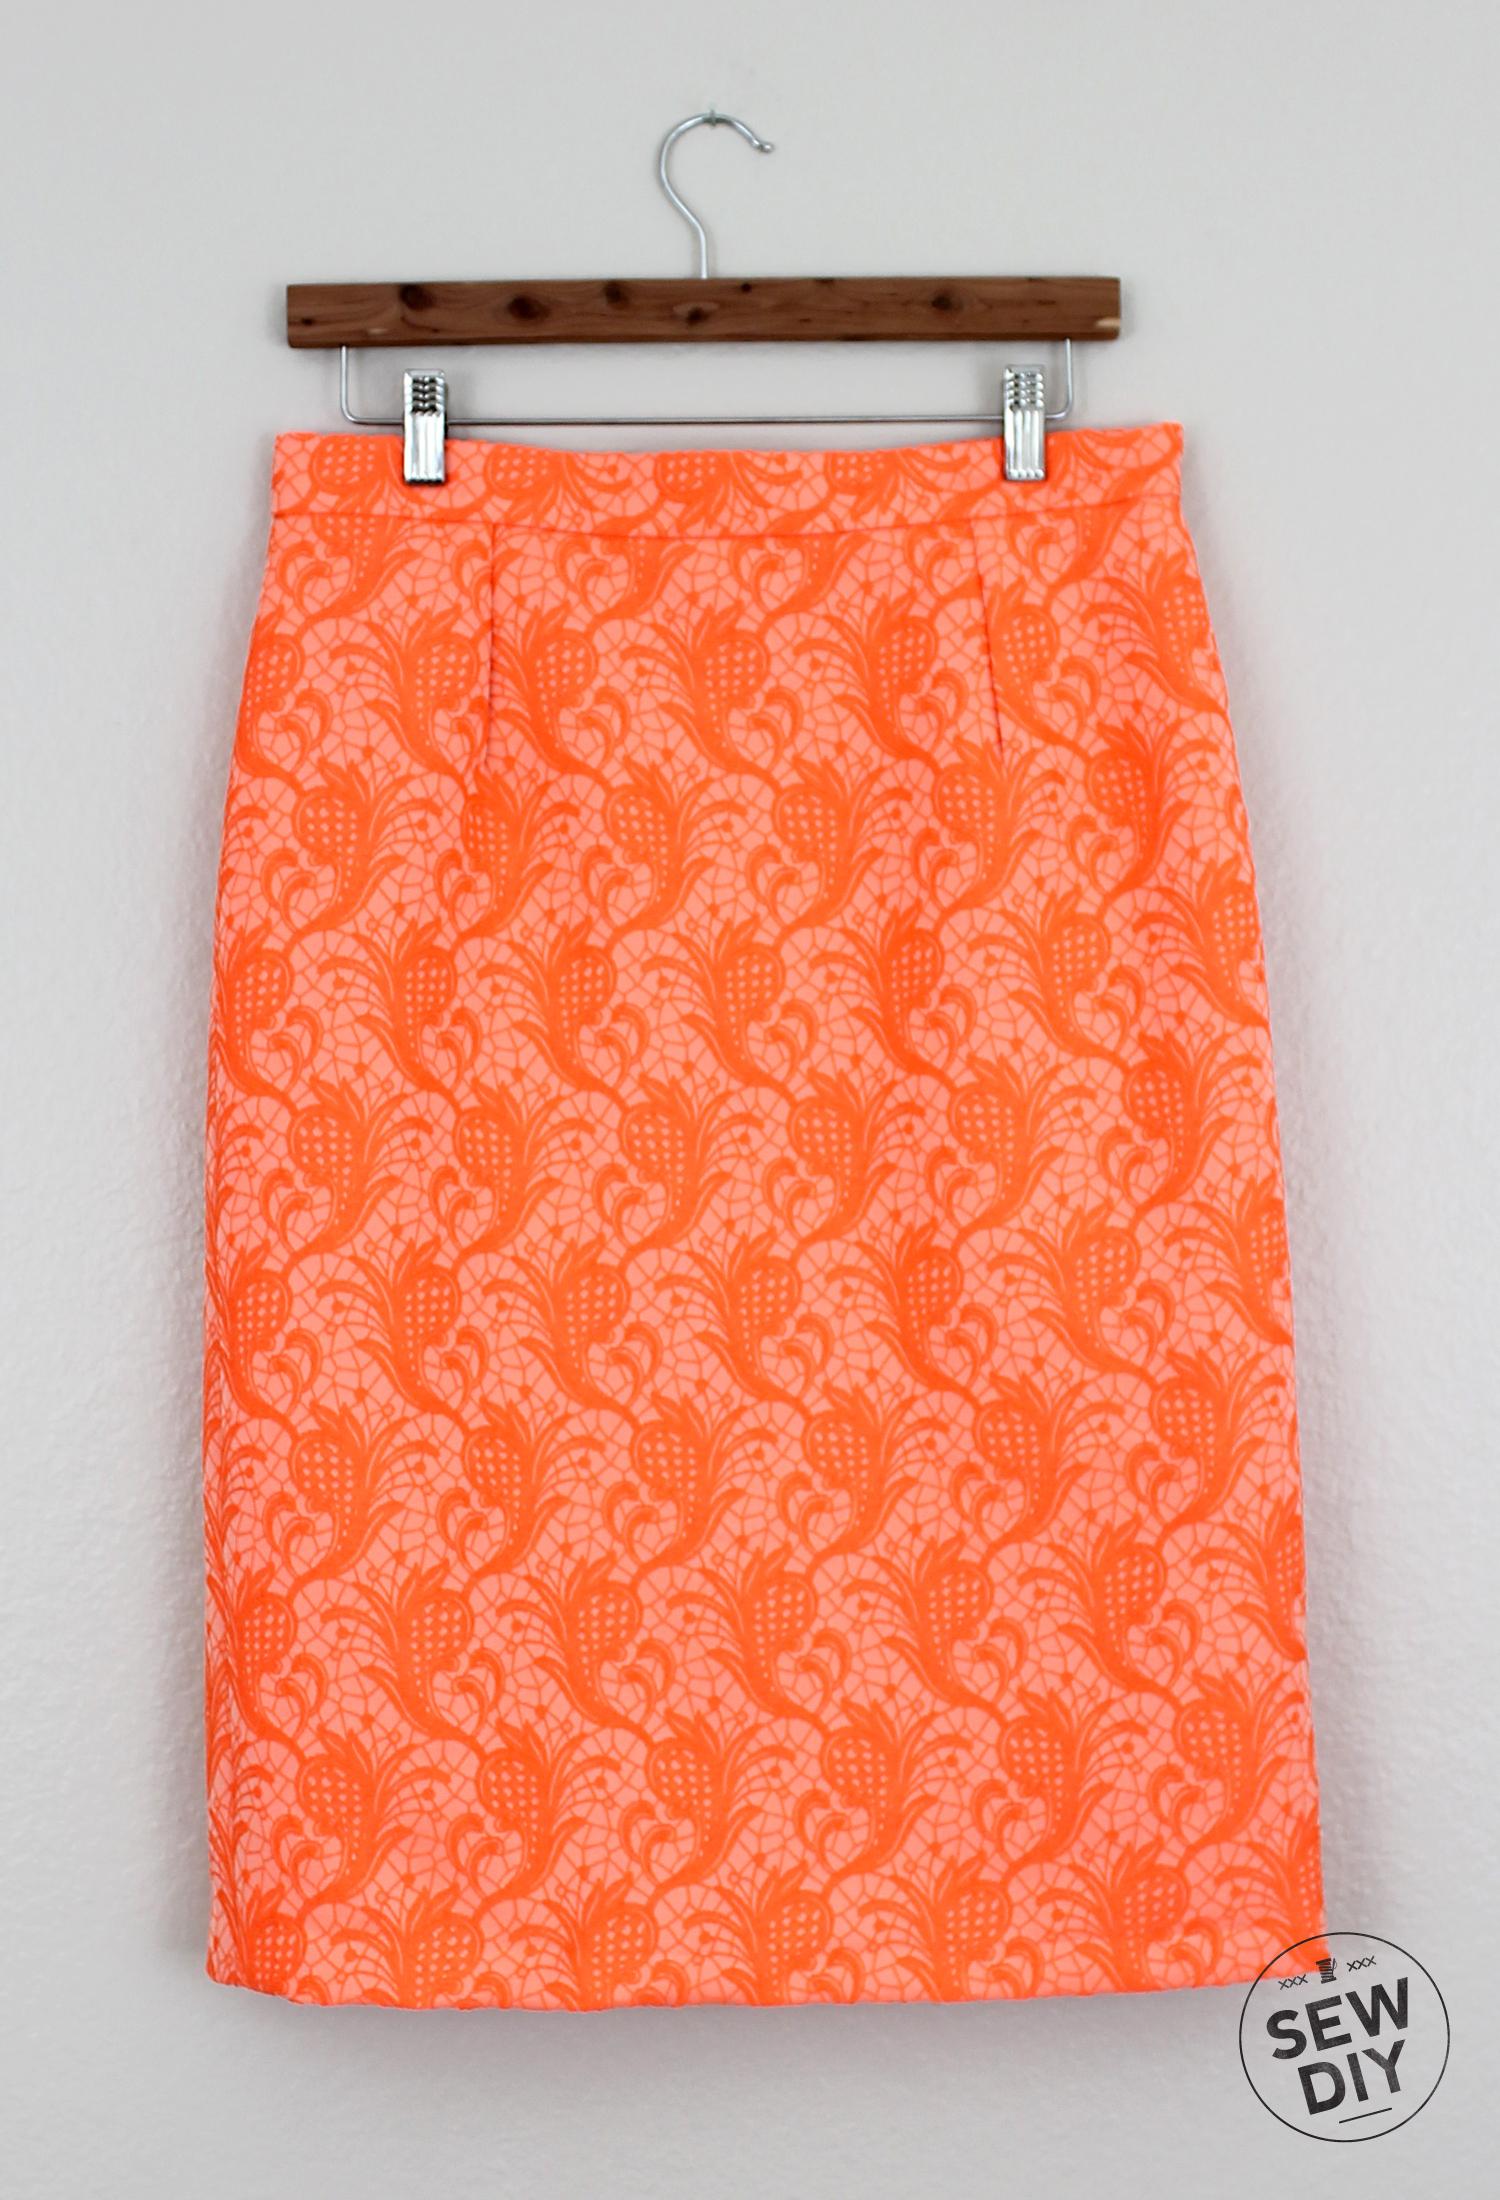 Sew DIY Orange Brocade Skirt Front